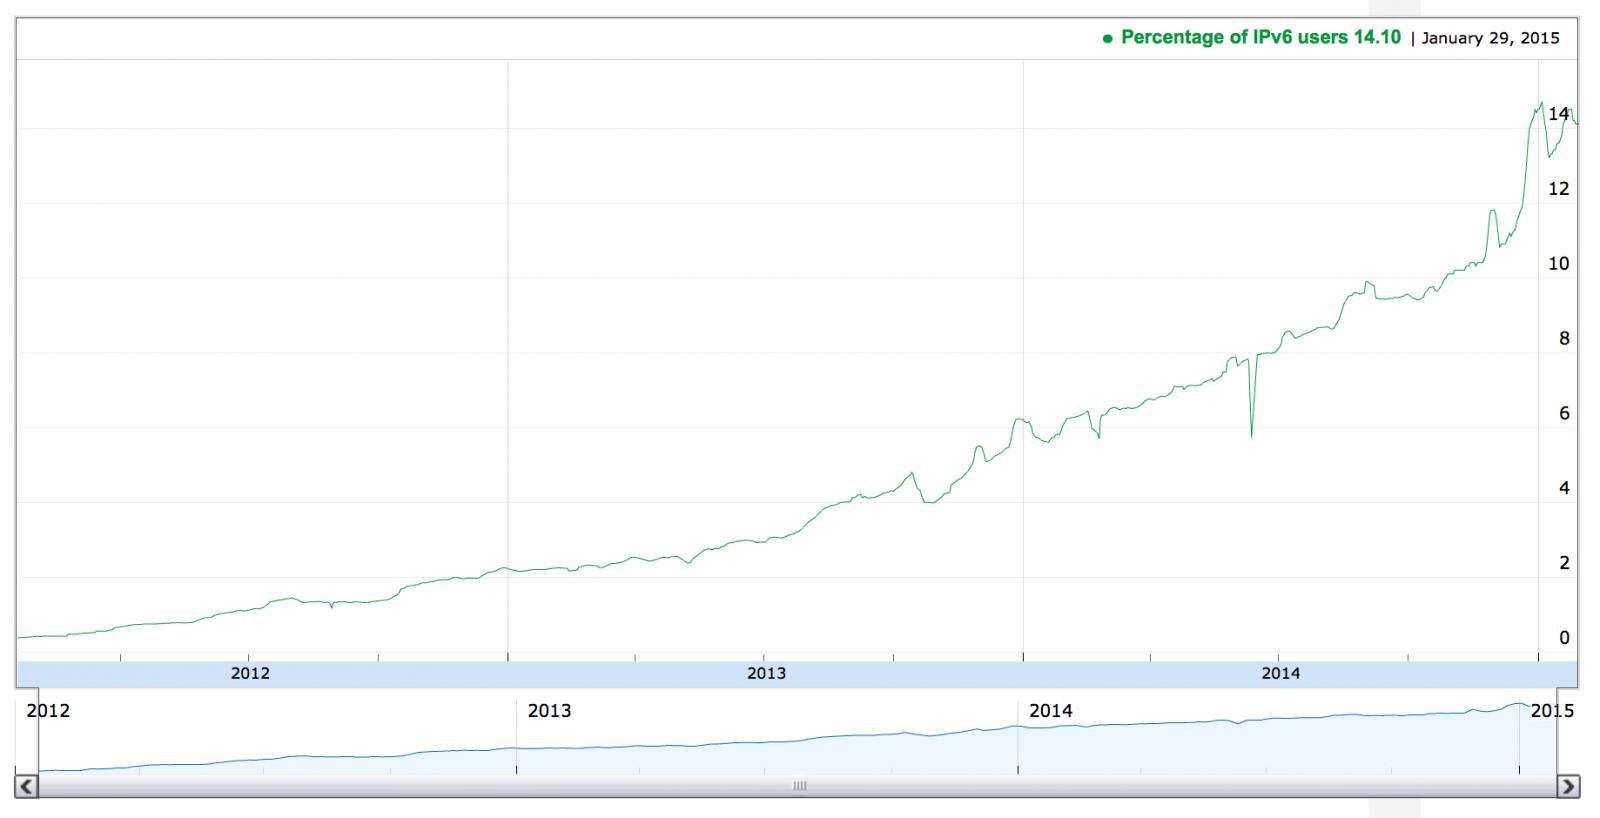 Percentage of IPv6 Users - 2015